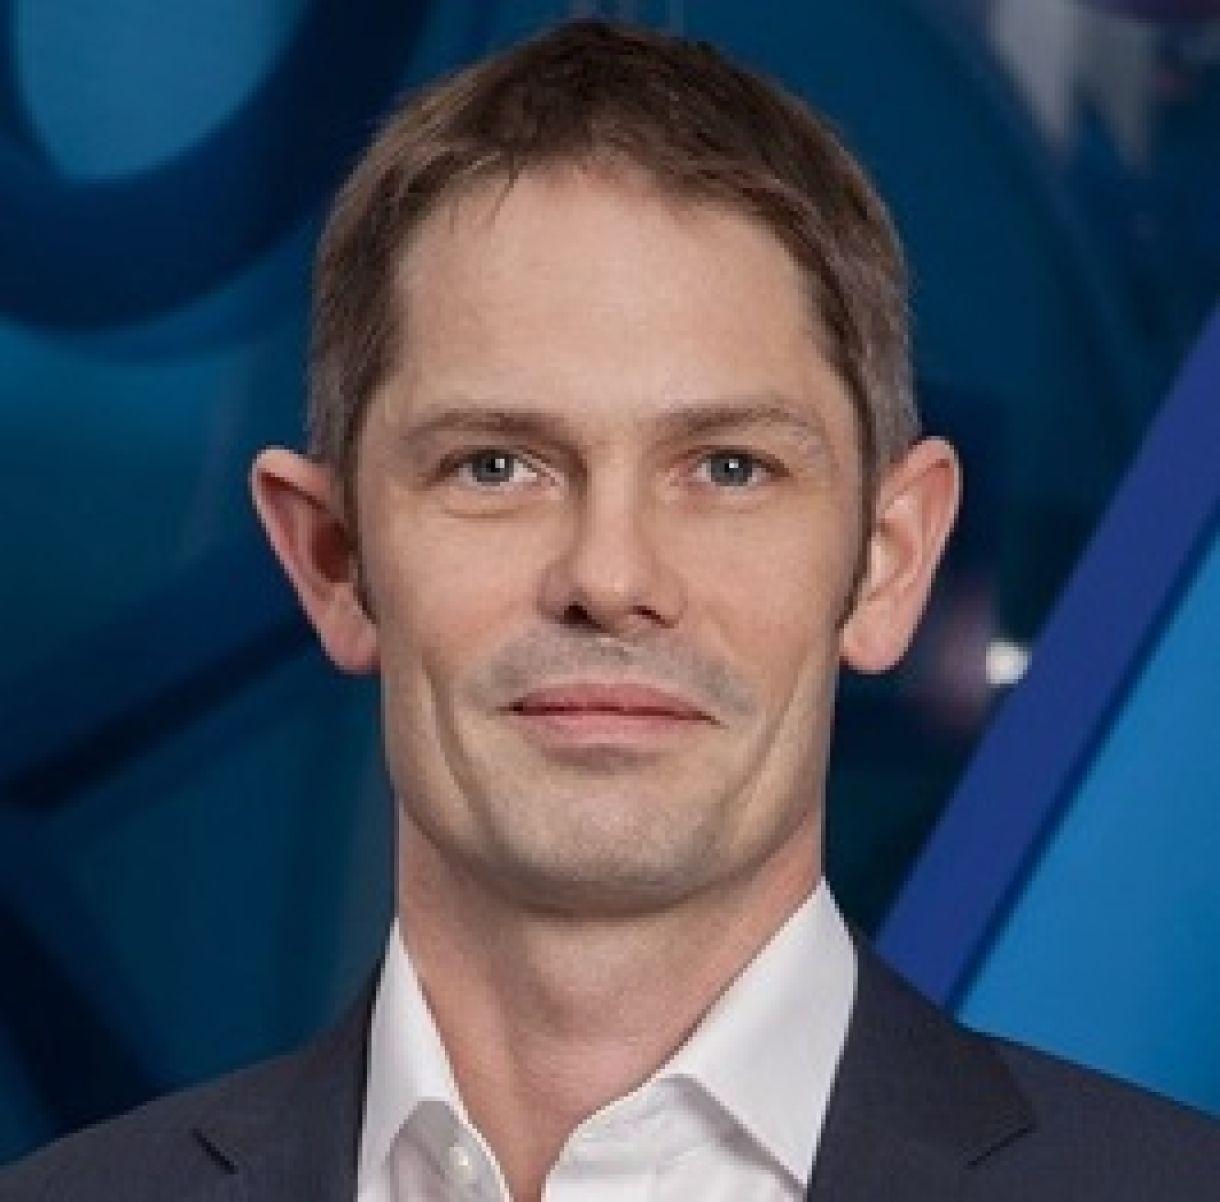 Fergal Gara Resigns as the Vice President of SCE UK